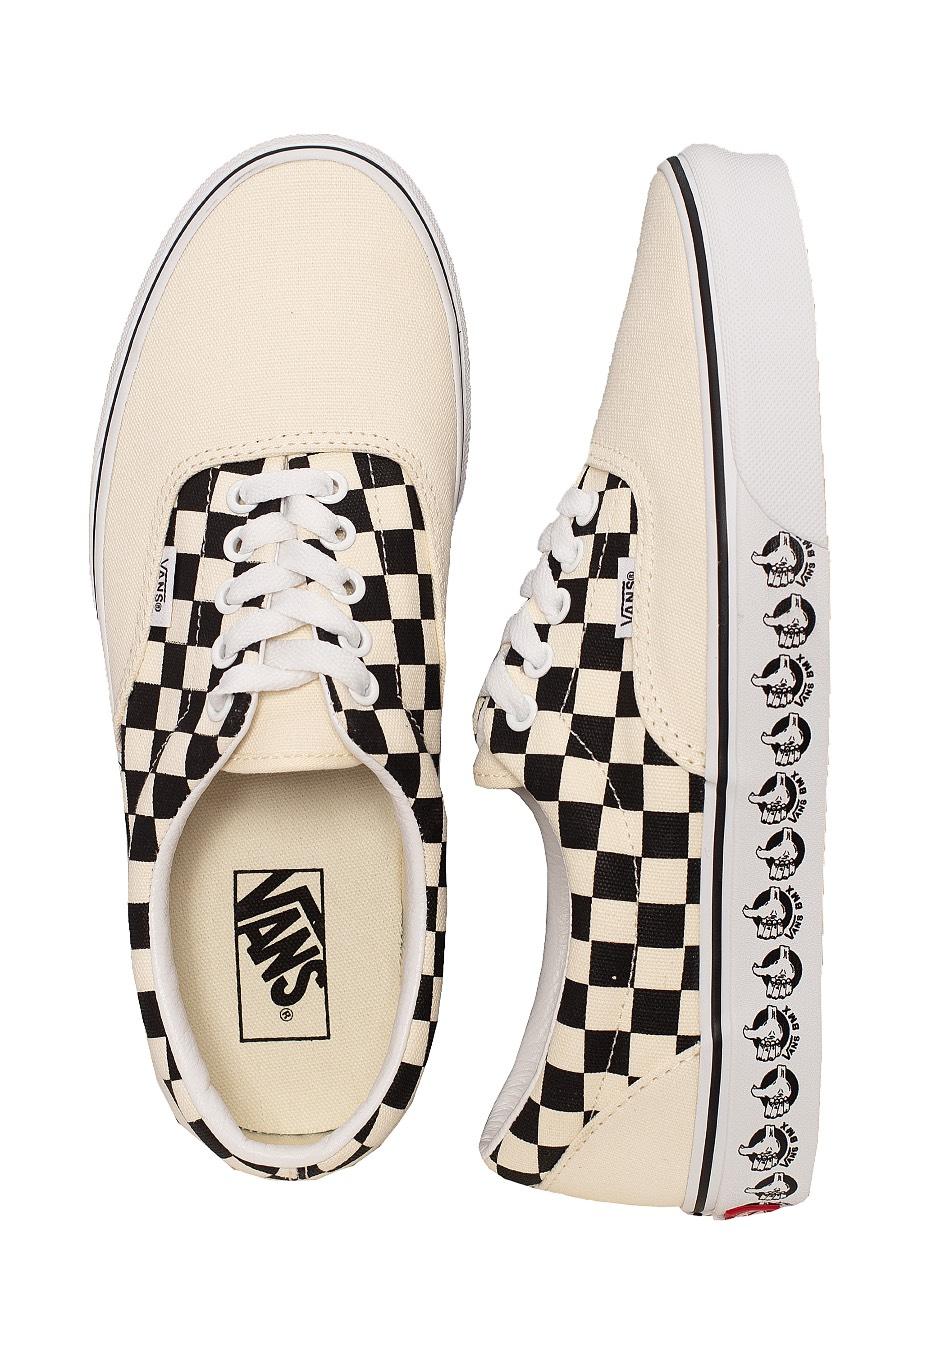 Vans Era Vans Bmx WhiteBlack Chaussures